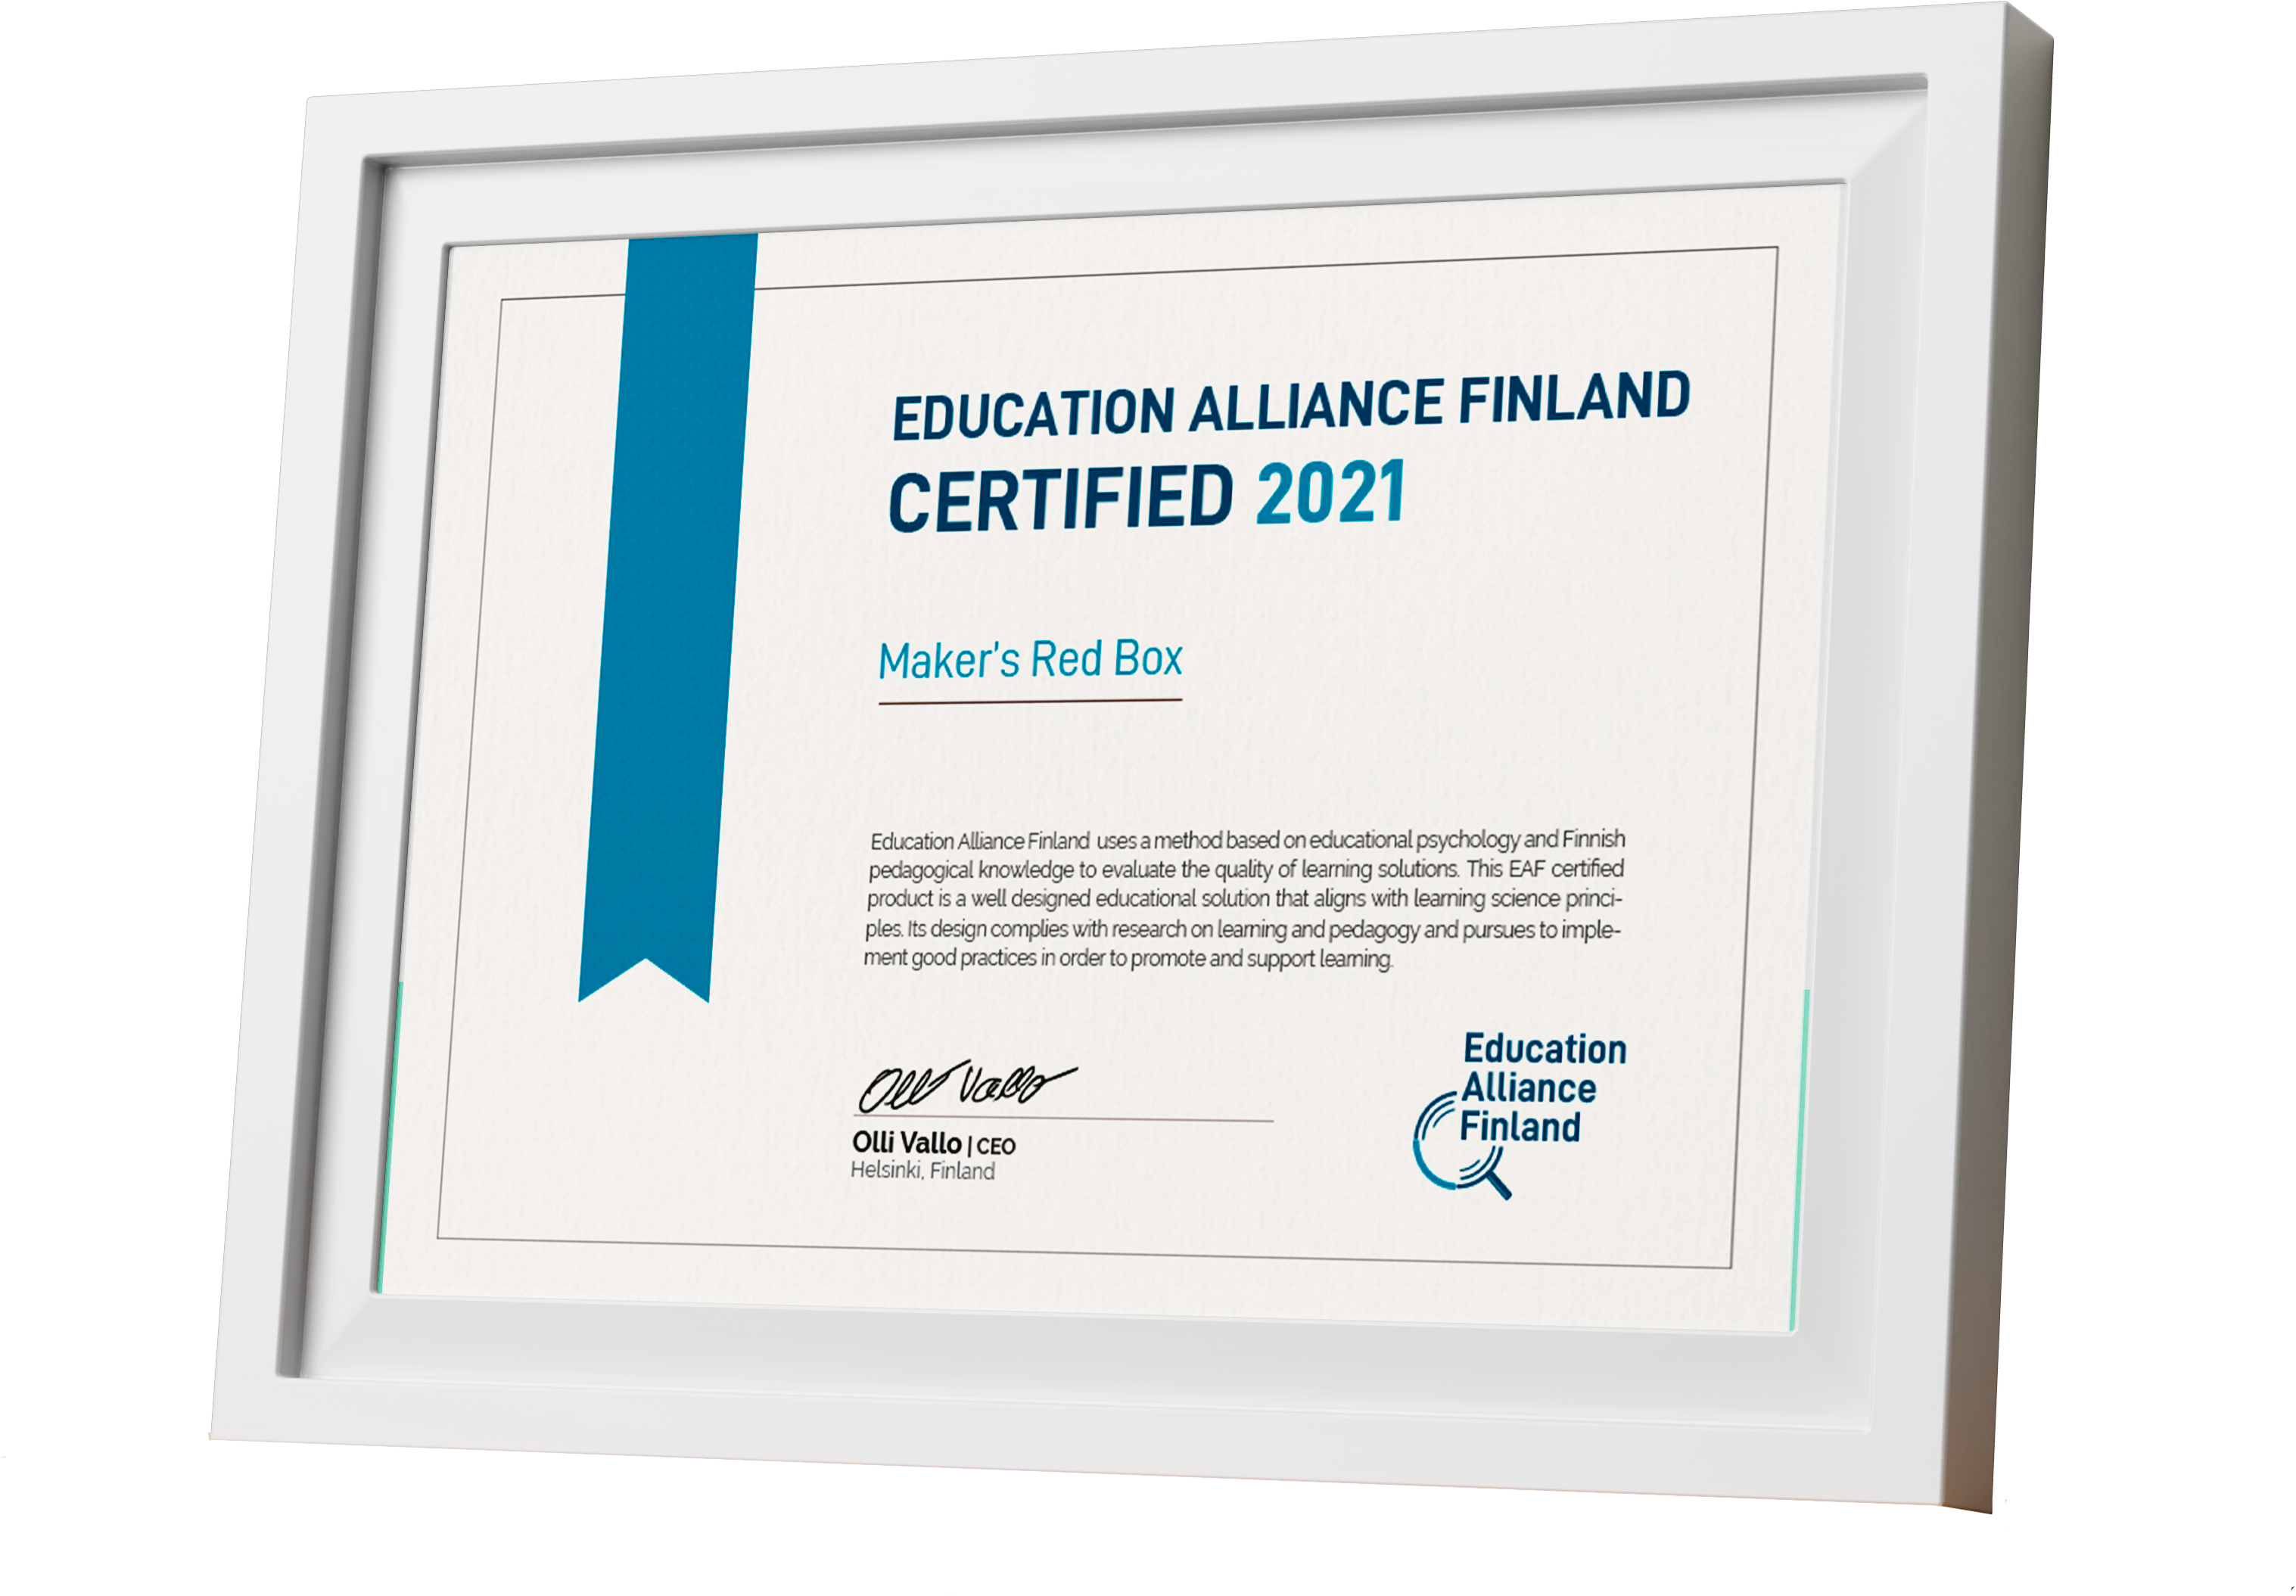 EduAllianceFinland-mockup1